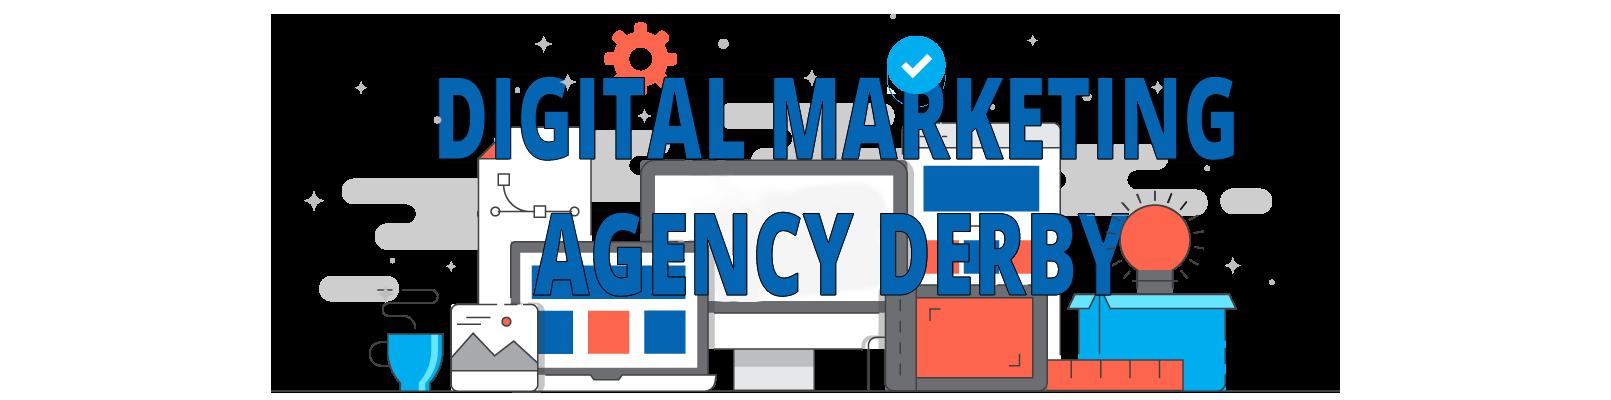 seek social digital marketing agency derby header with transparent background